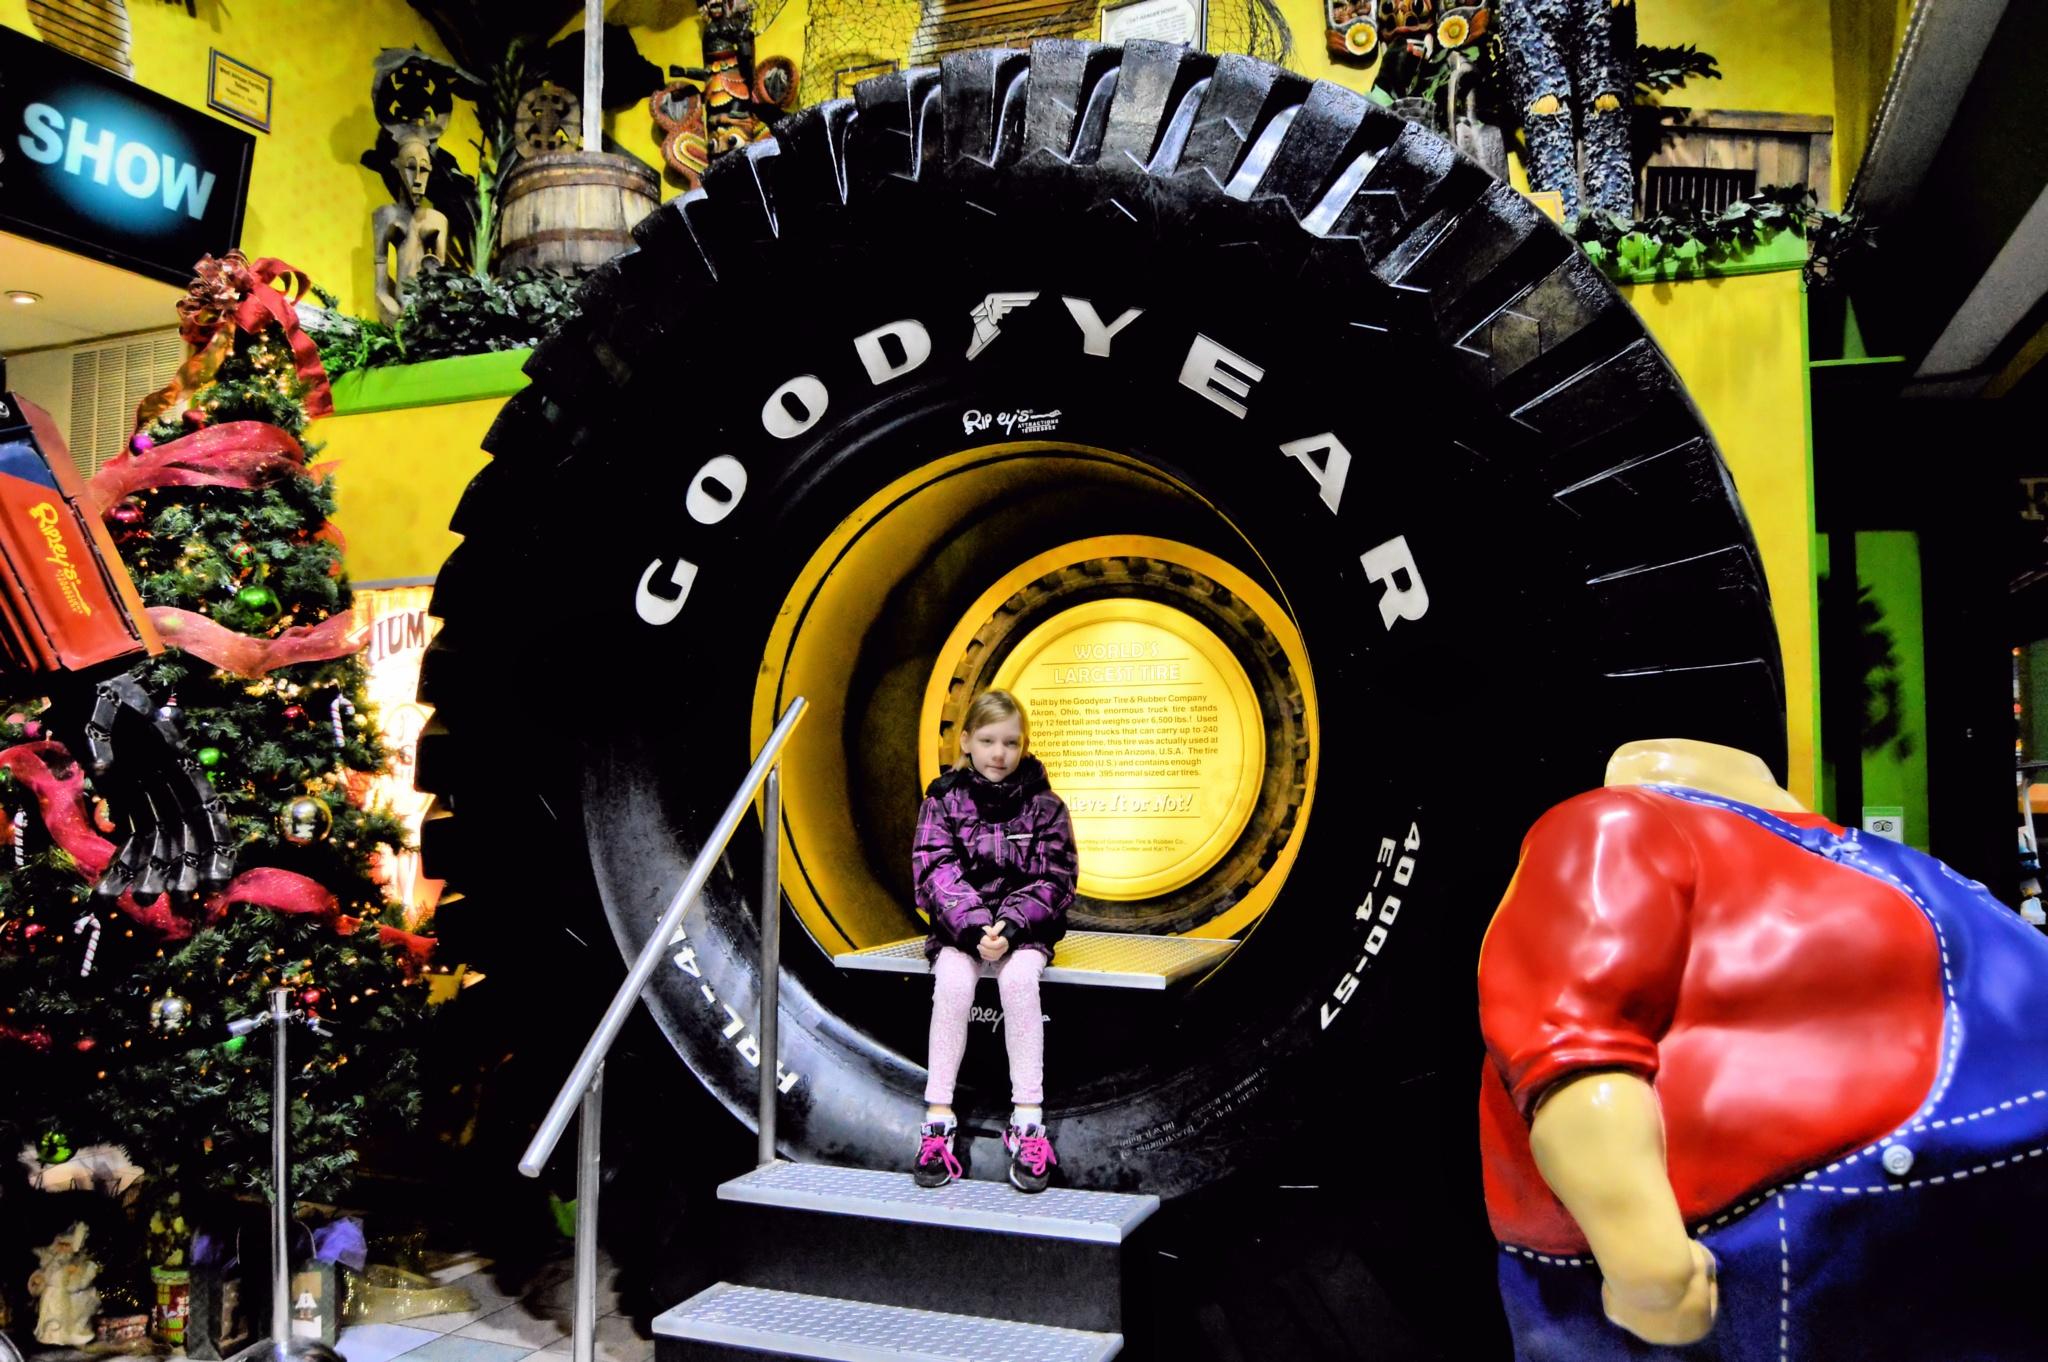 World's Largest Goodyear Tire by Jennifer Asher